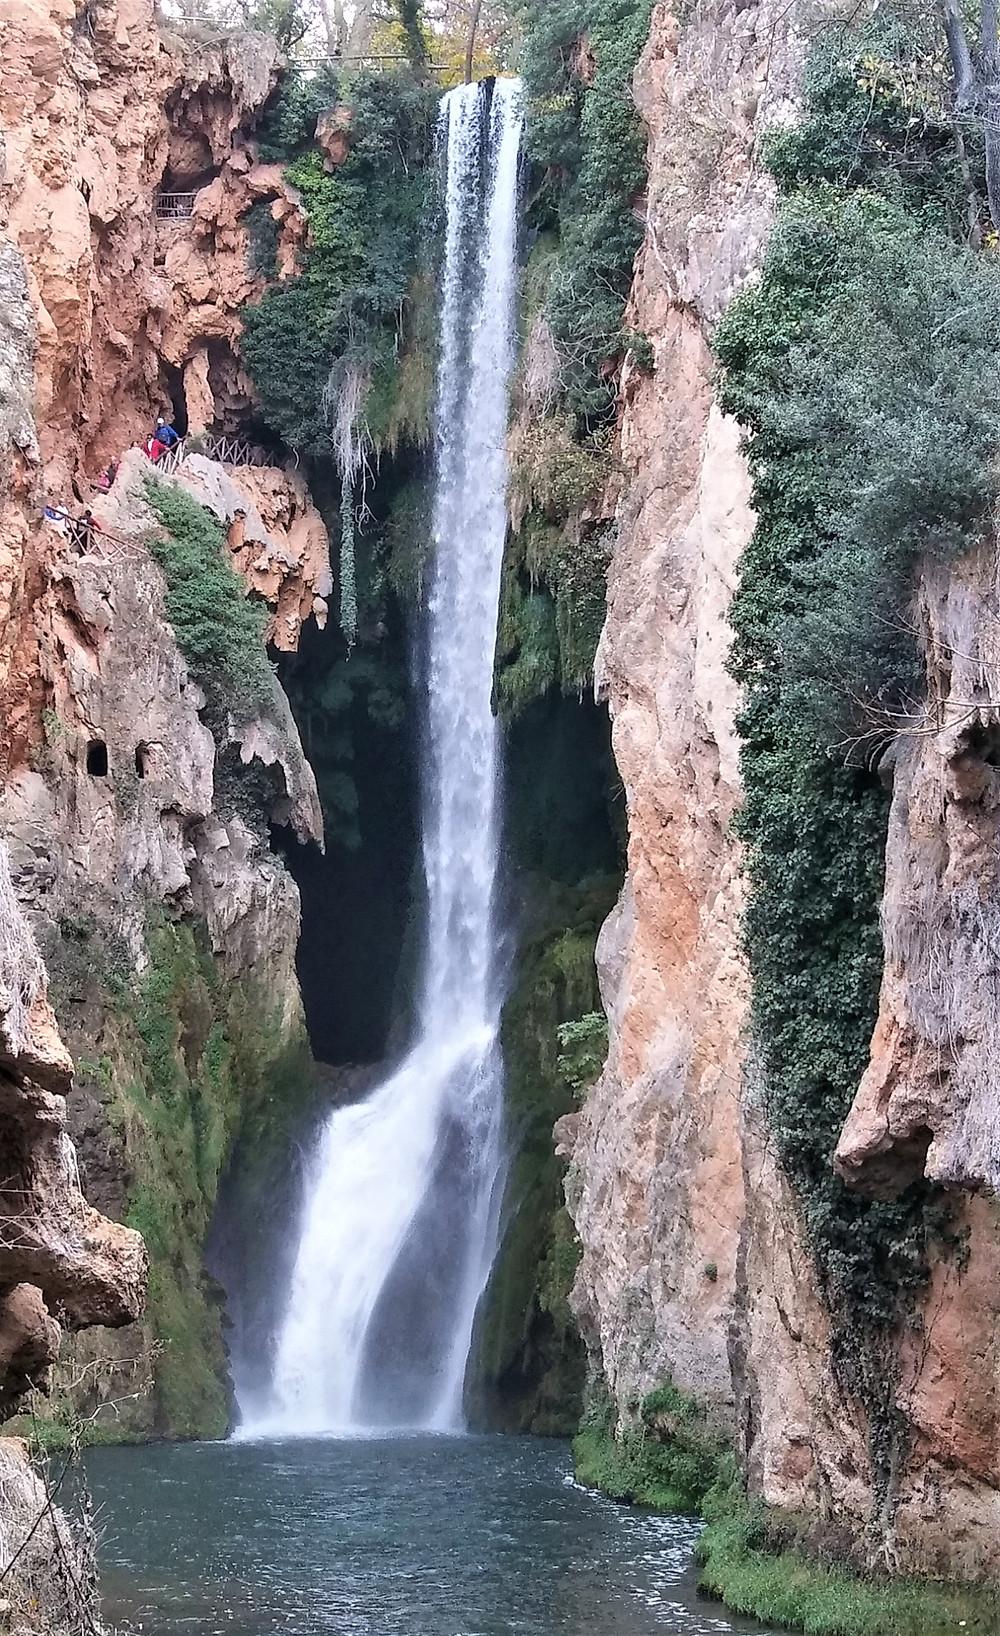 Водопад Кола-де-Кабальо в парке Монастырь Пьедра